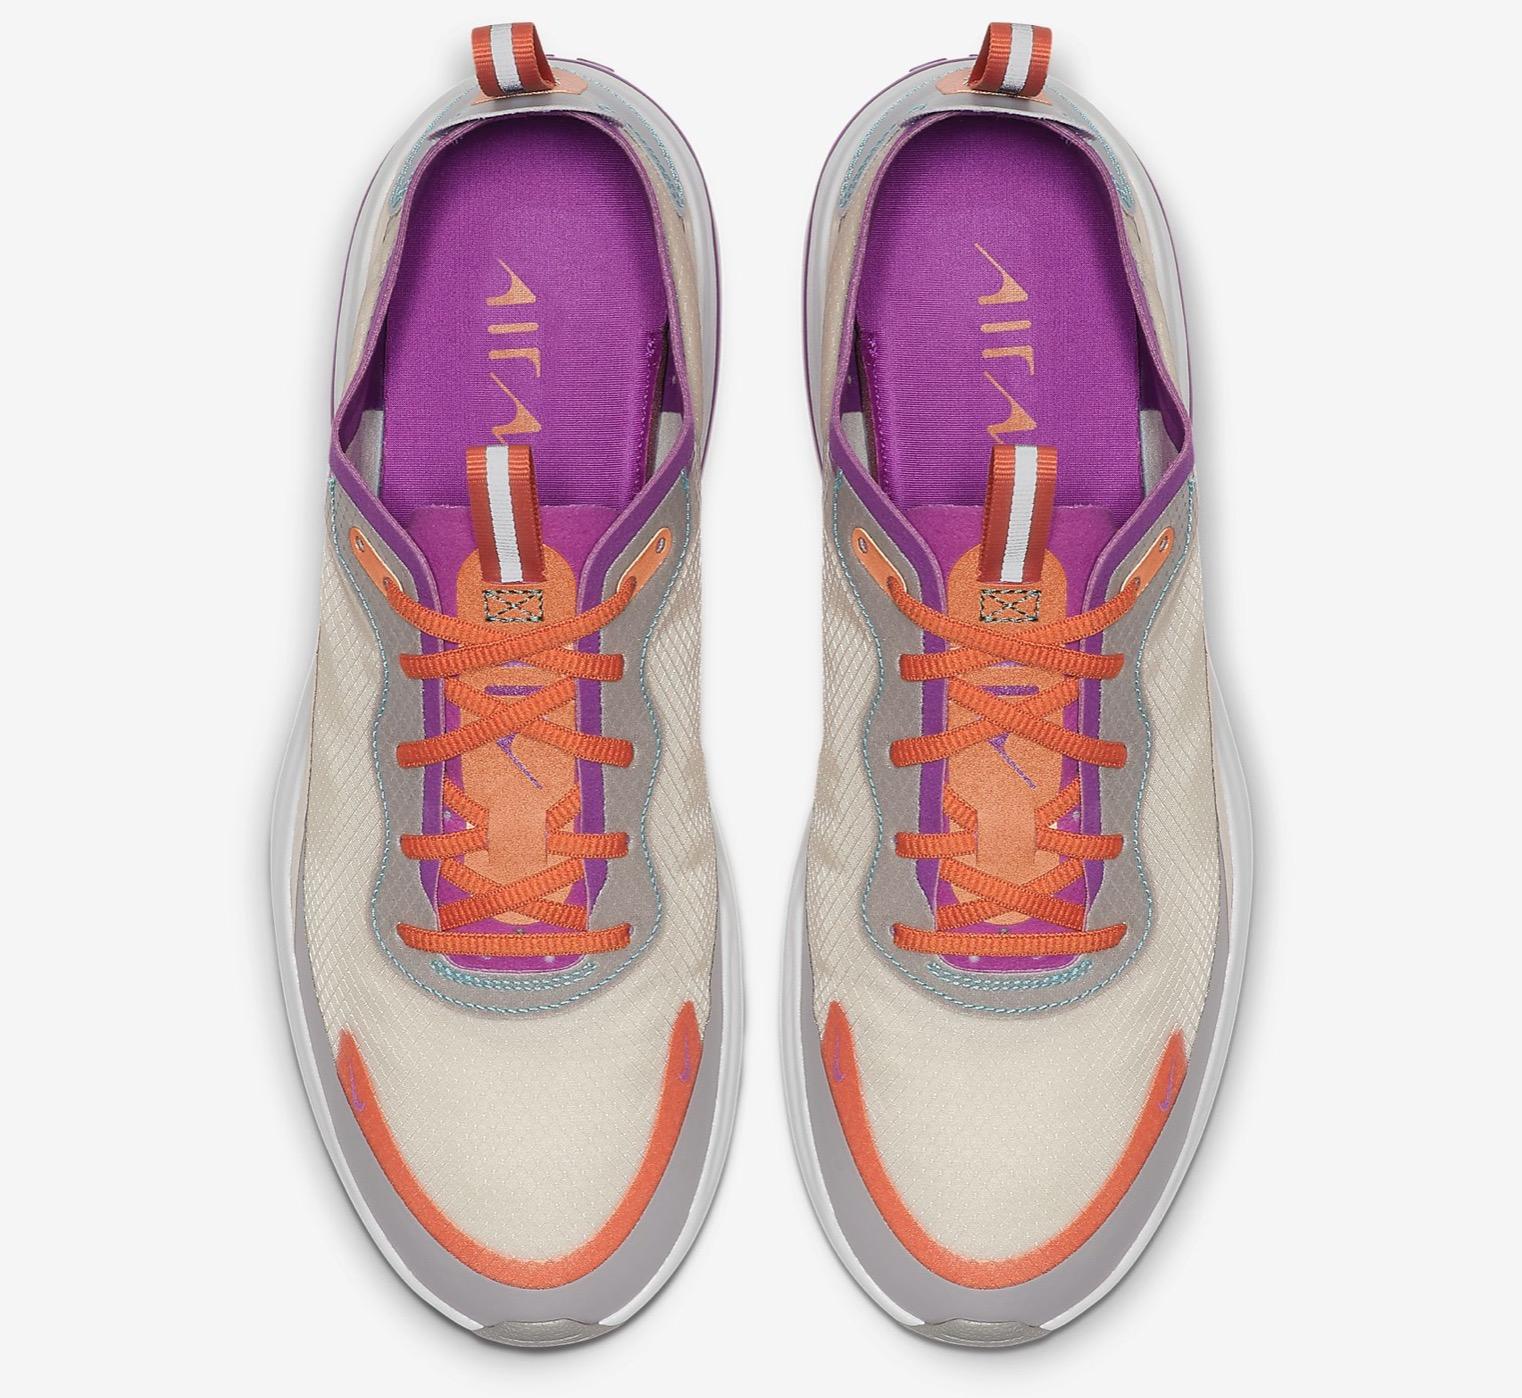 Nike Air Max DiaLight Orewood Brown/Starfish/Atmosphere Grey/Hyper Violet top down